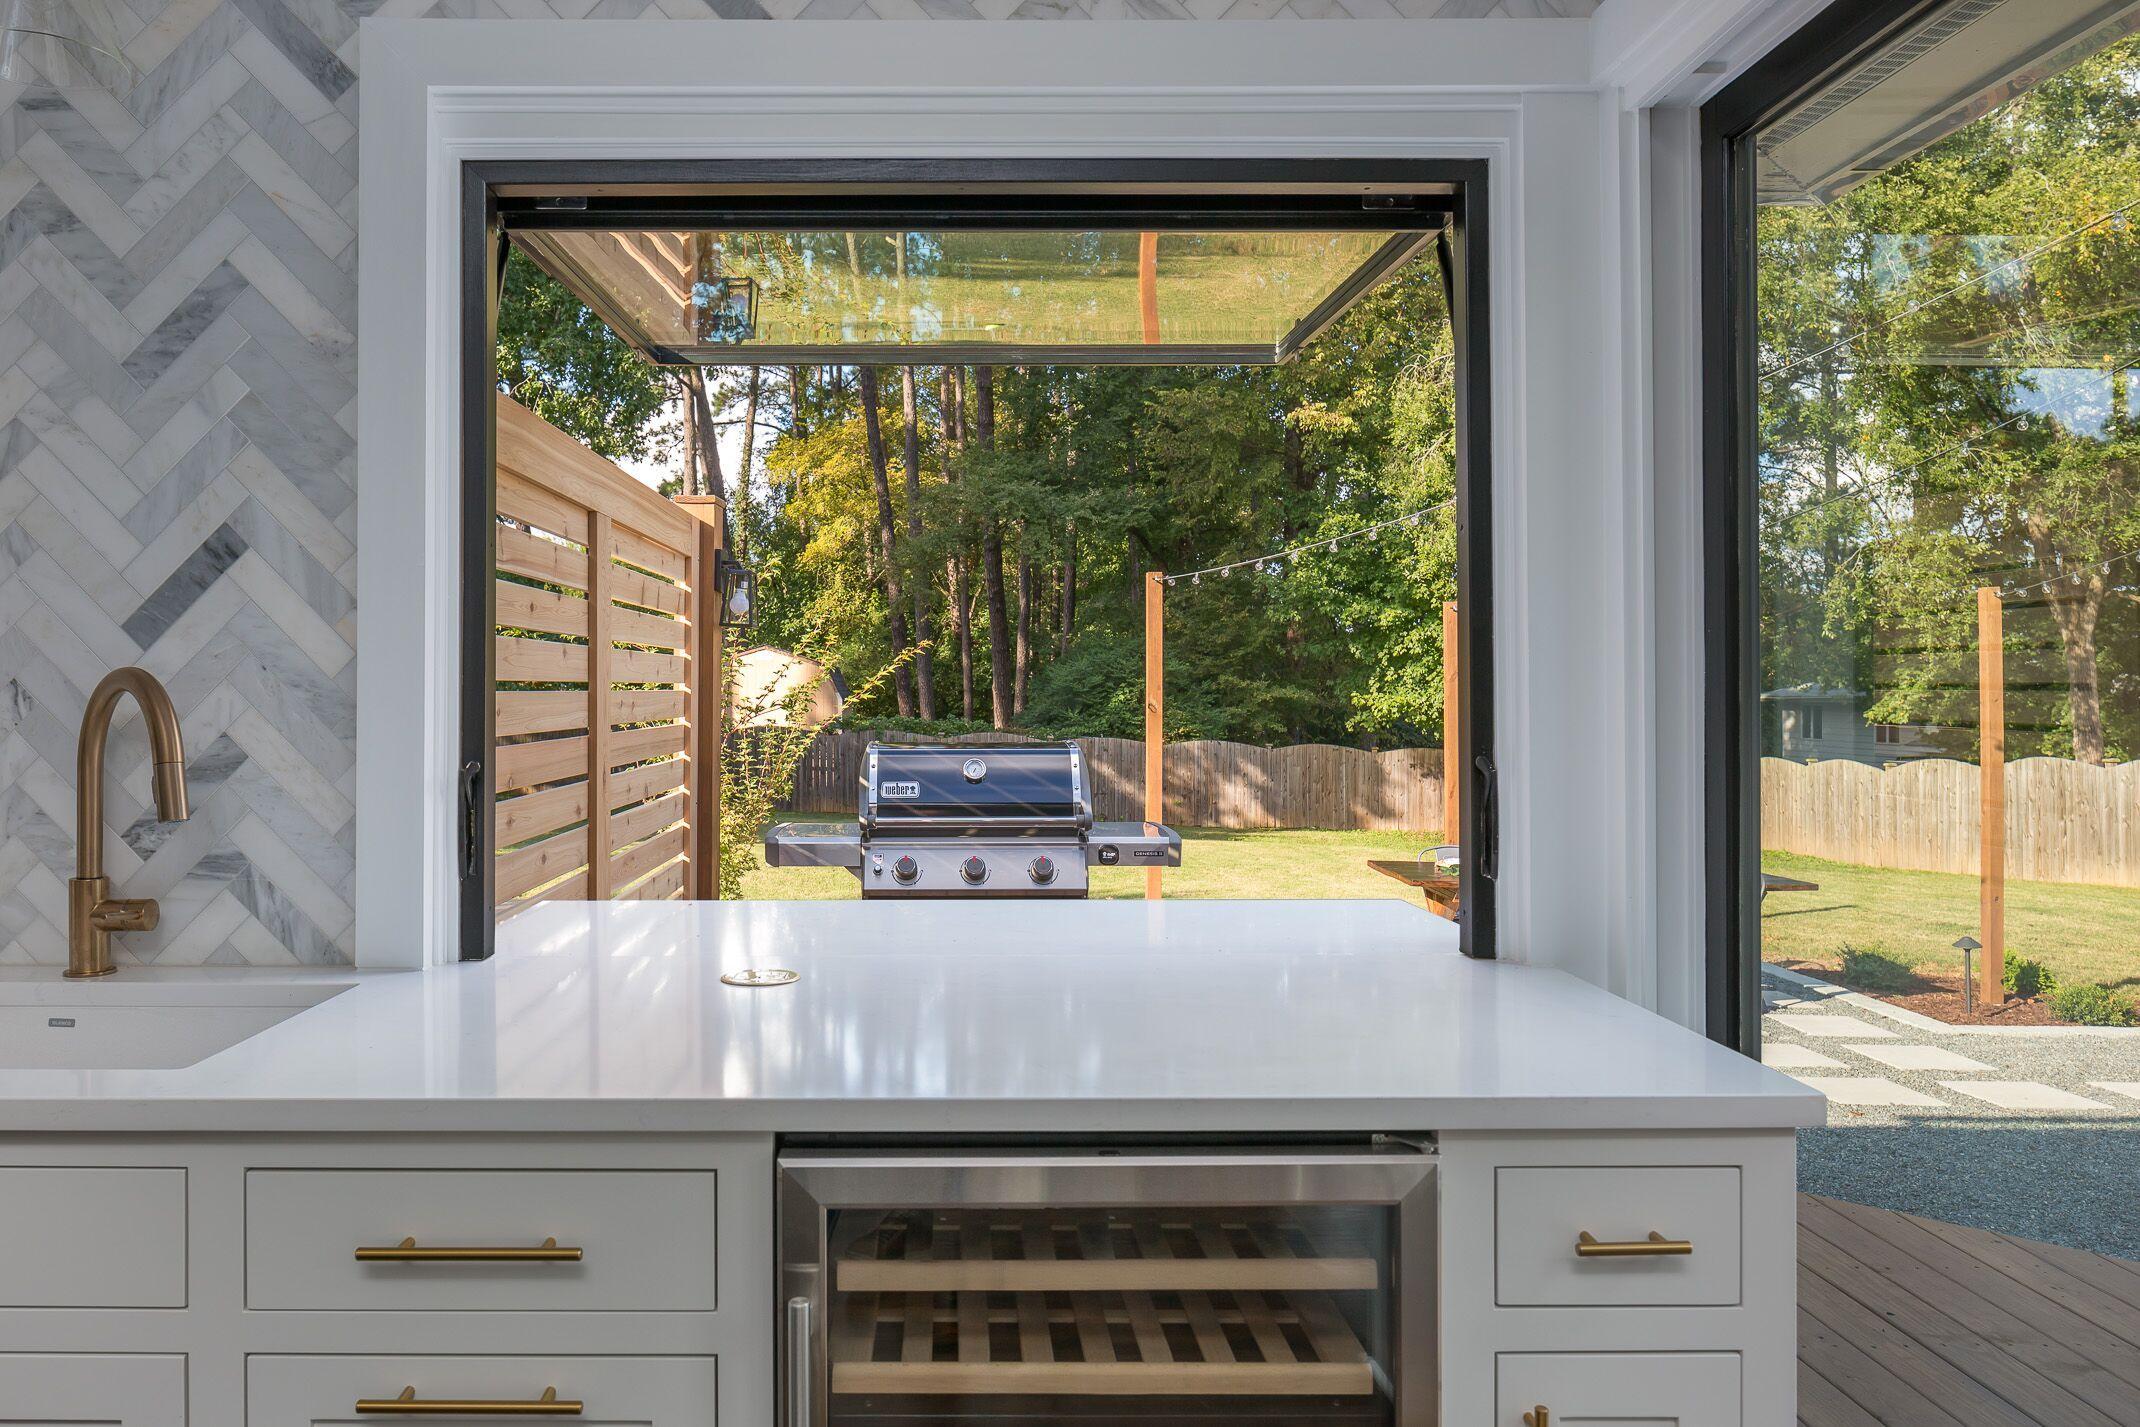 modern farmhouse kitchen window with pass through window modern farmhouse kitchens kitchen on farmhouse kitchen window id=37922